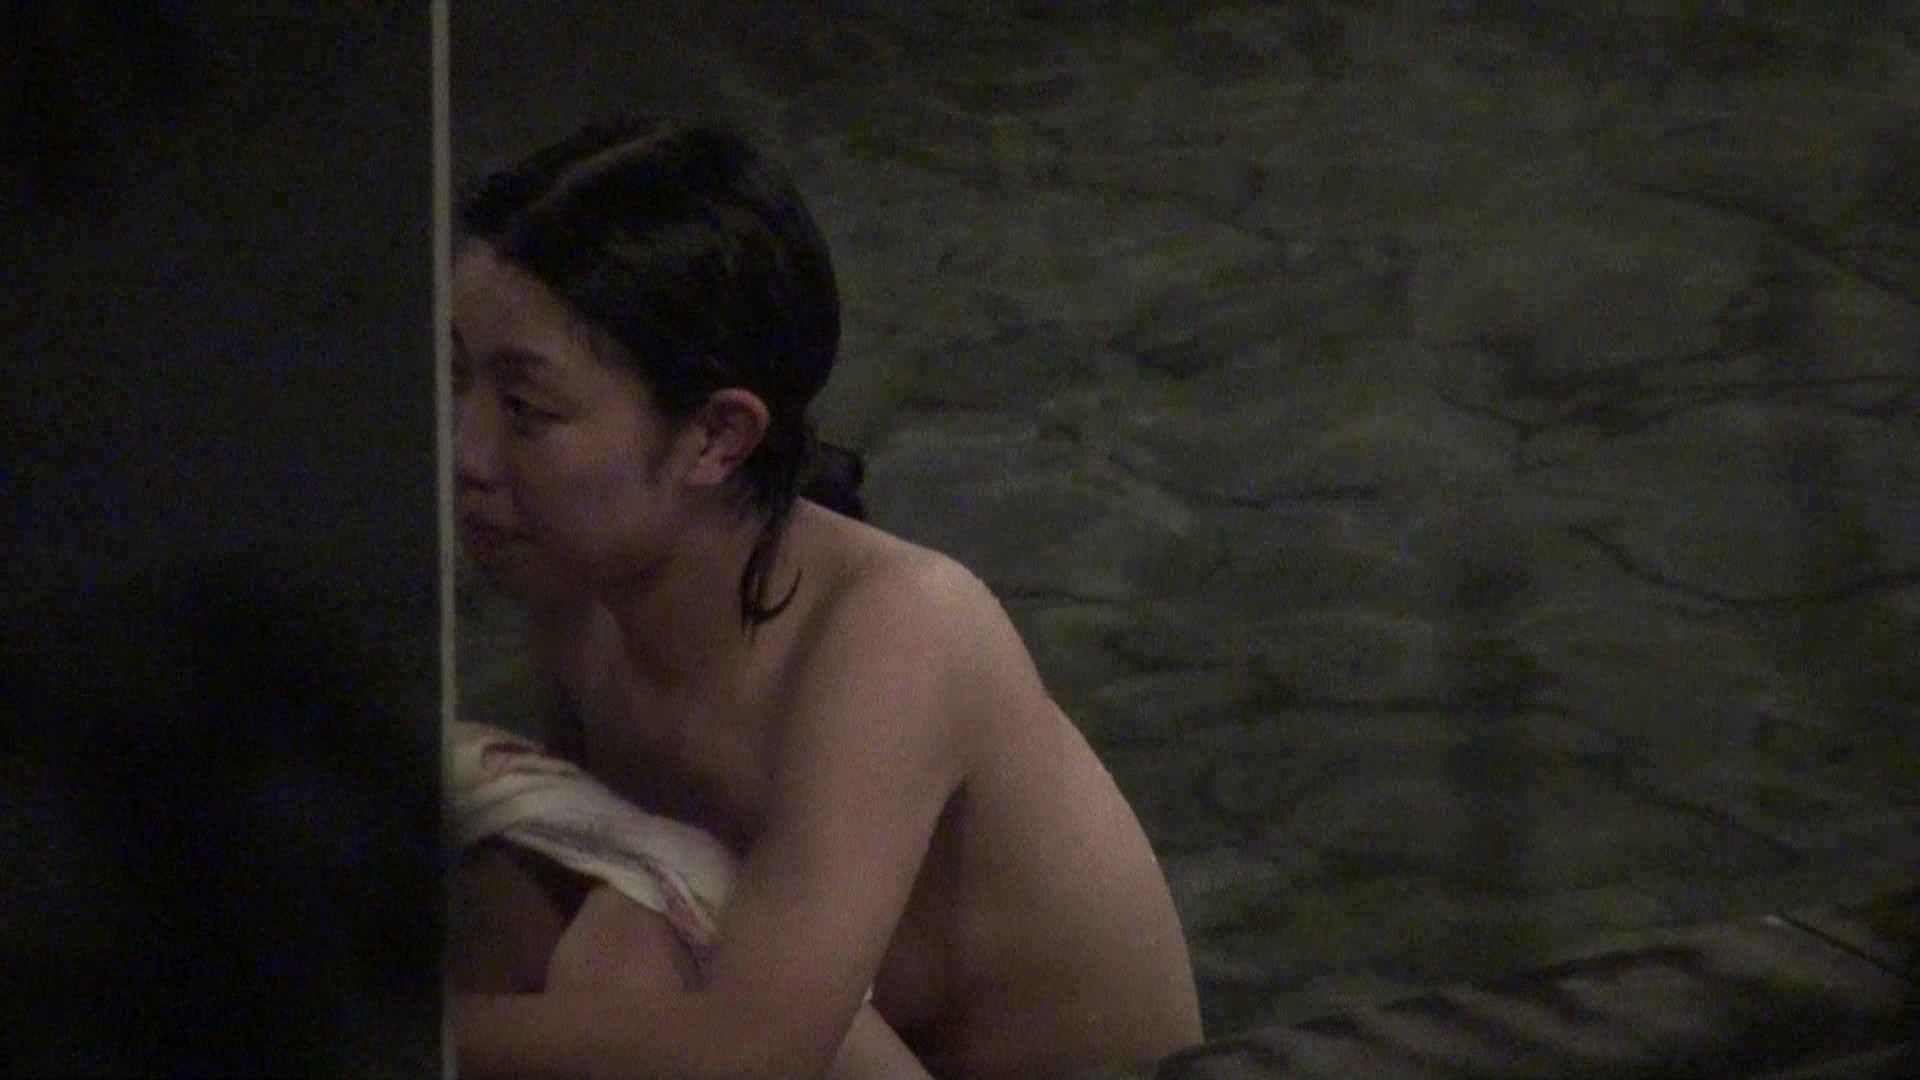 Aquaな露天風呂Vol.330 盗撮   HなOL  83pic 24